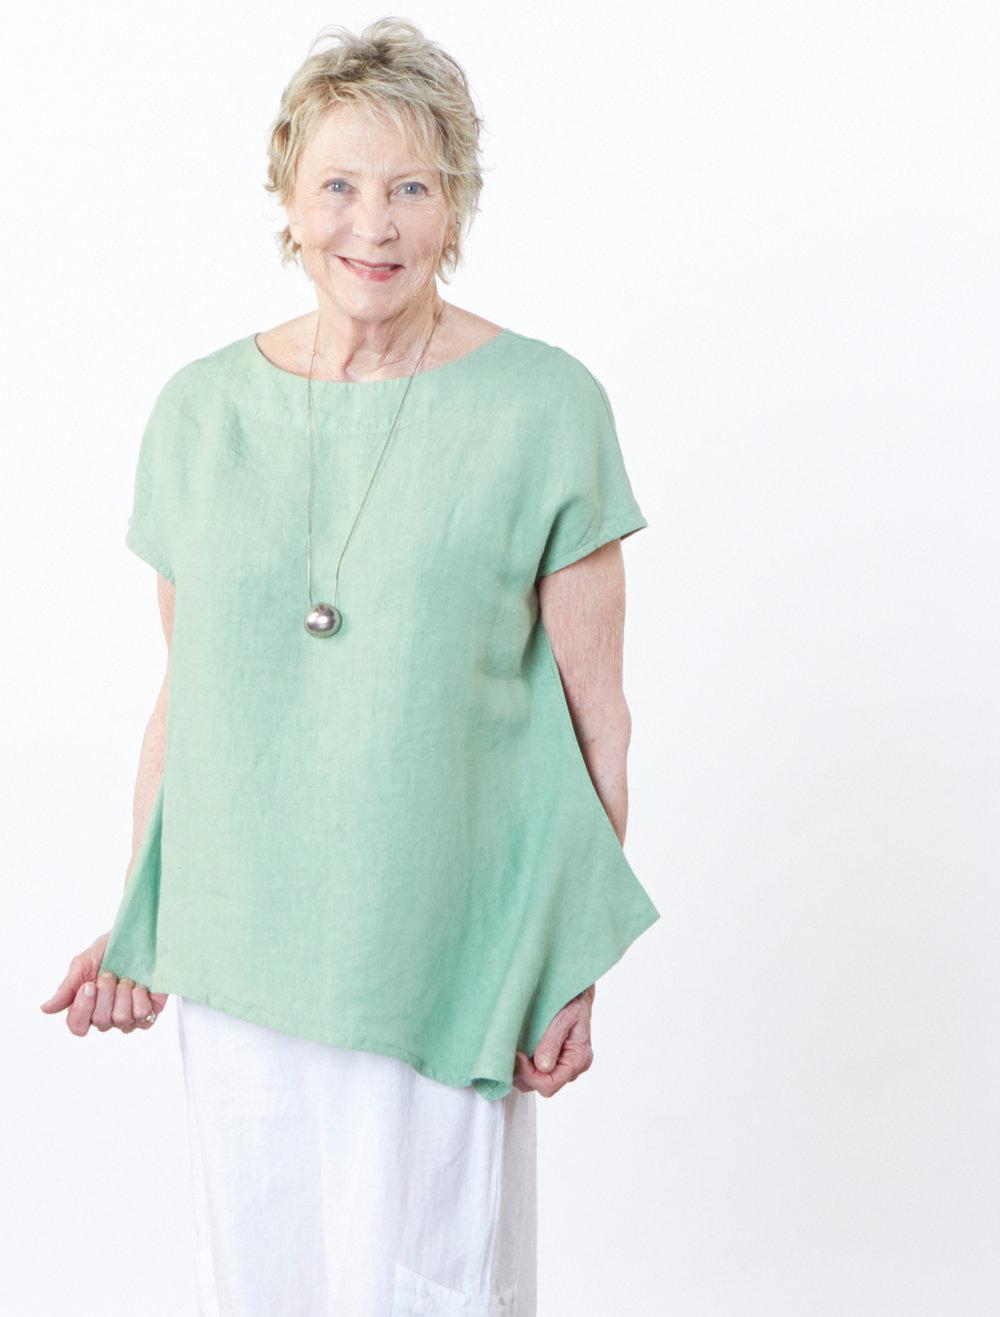 Ivy Shirt in Hosta Light Linen